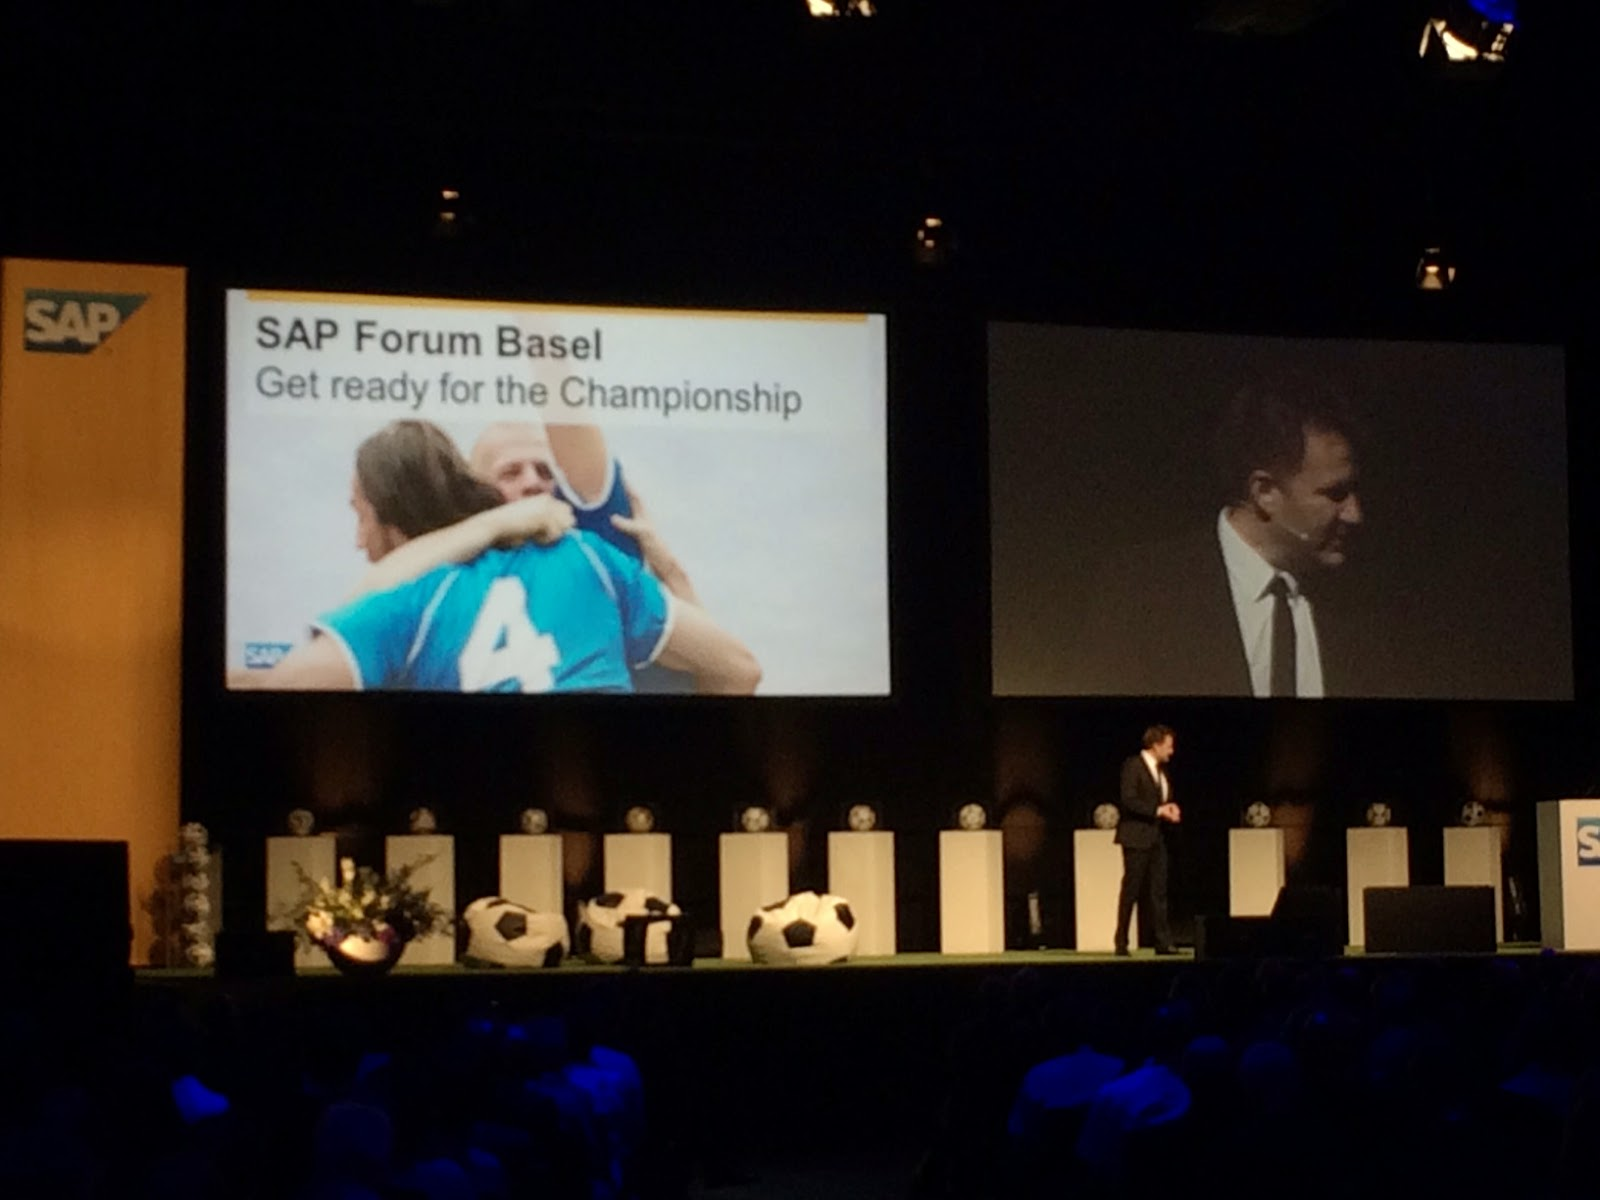 DigitalEkho CIO: 'Speaking today at @SAP Forum Basel'